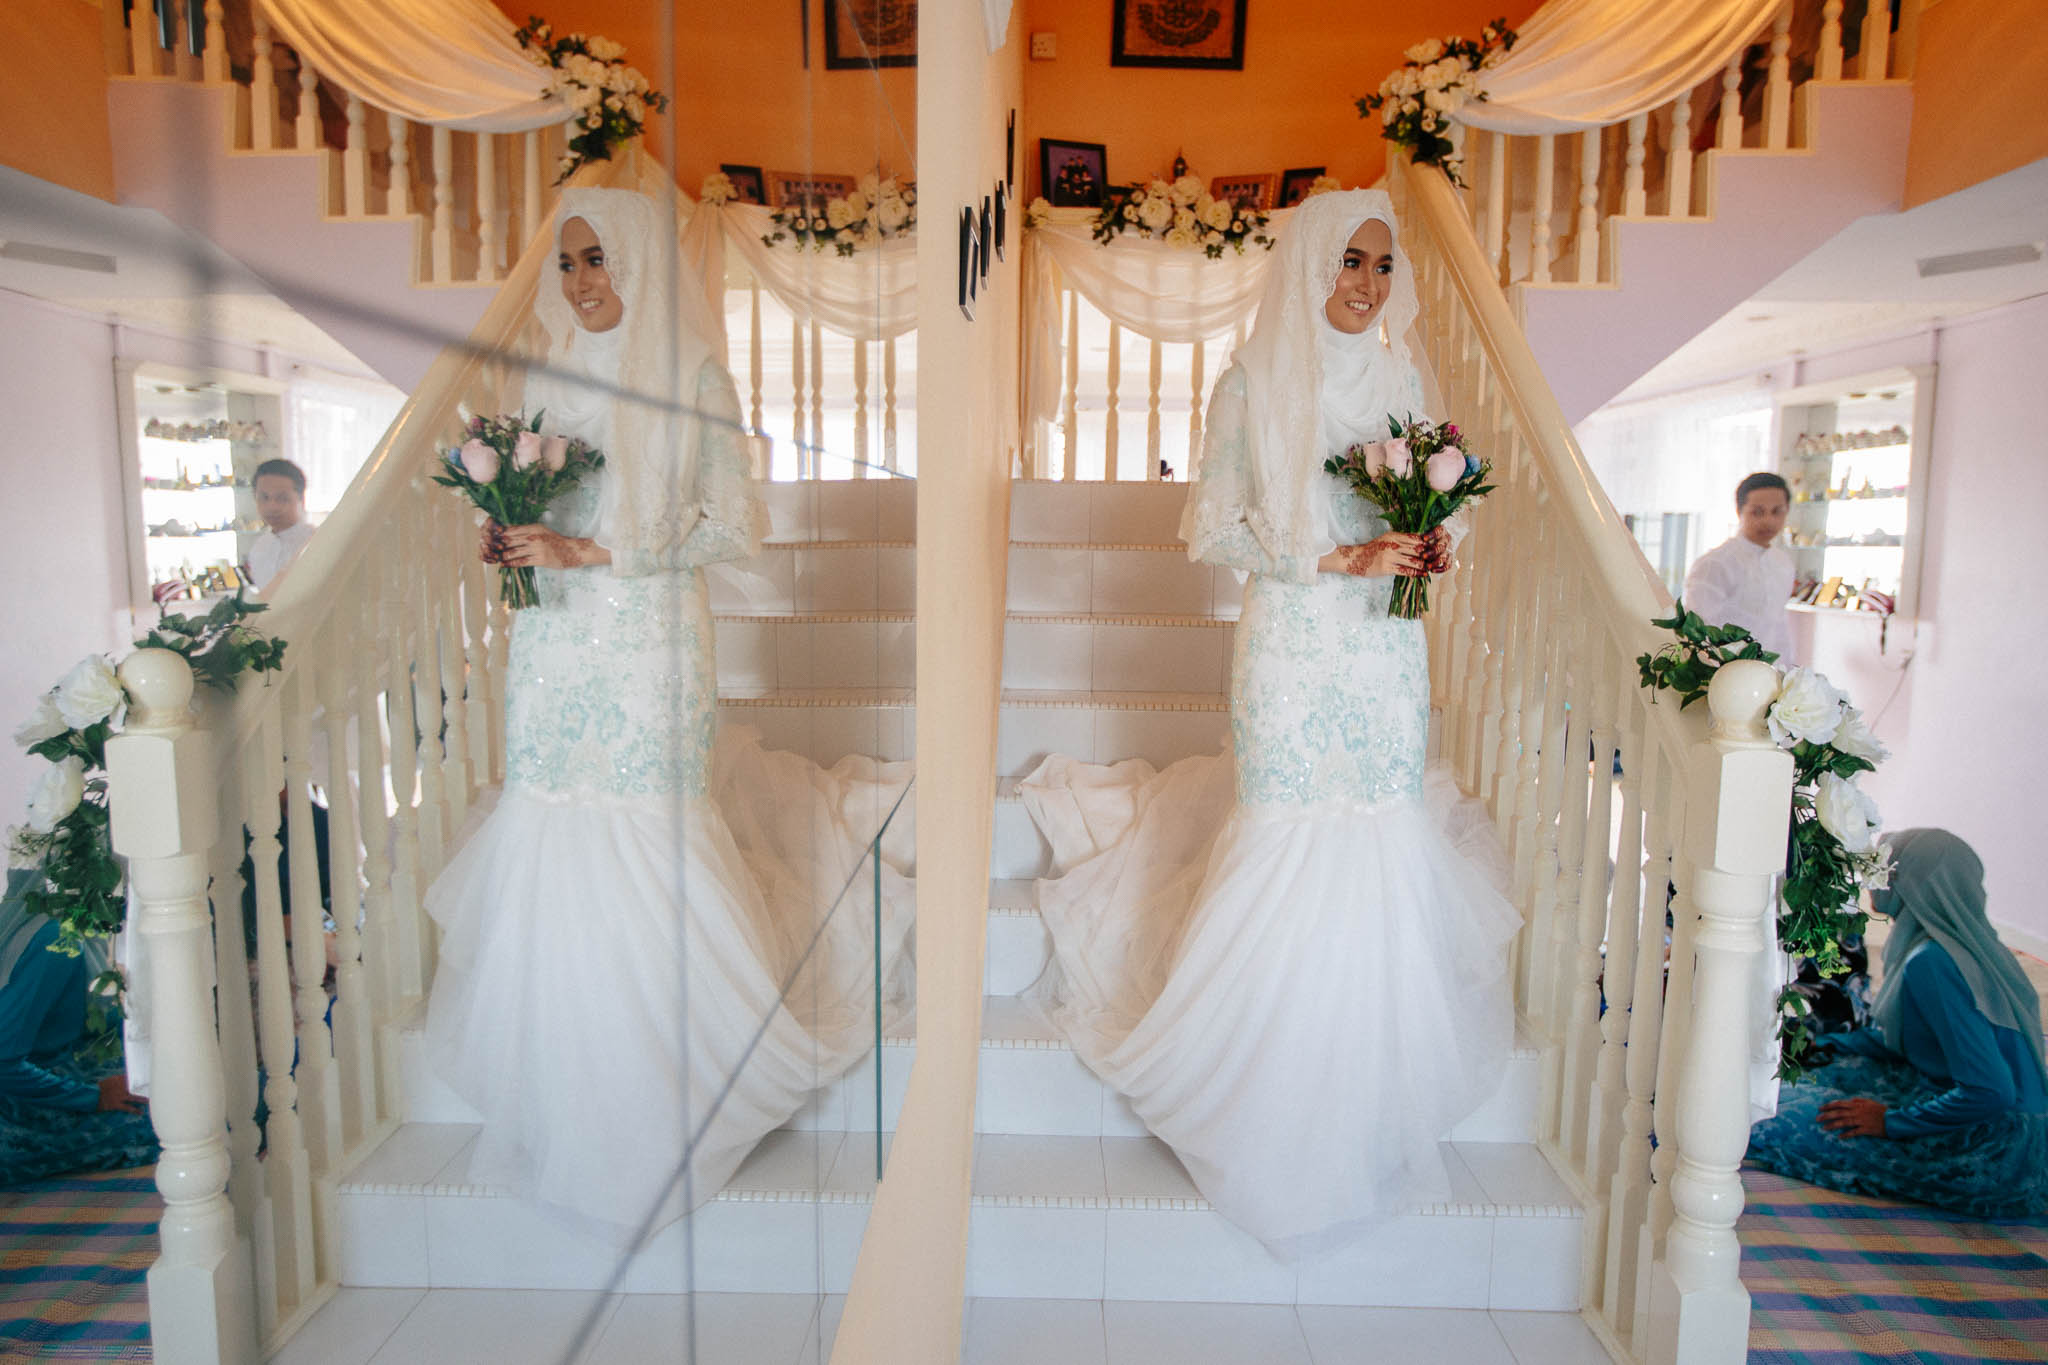 singapore-wedding-photographer-sharalyn-syazwan-009.jpg